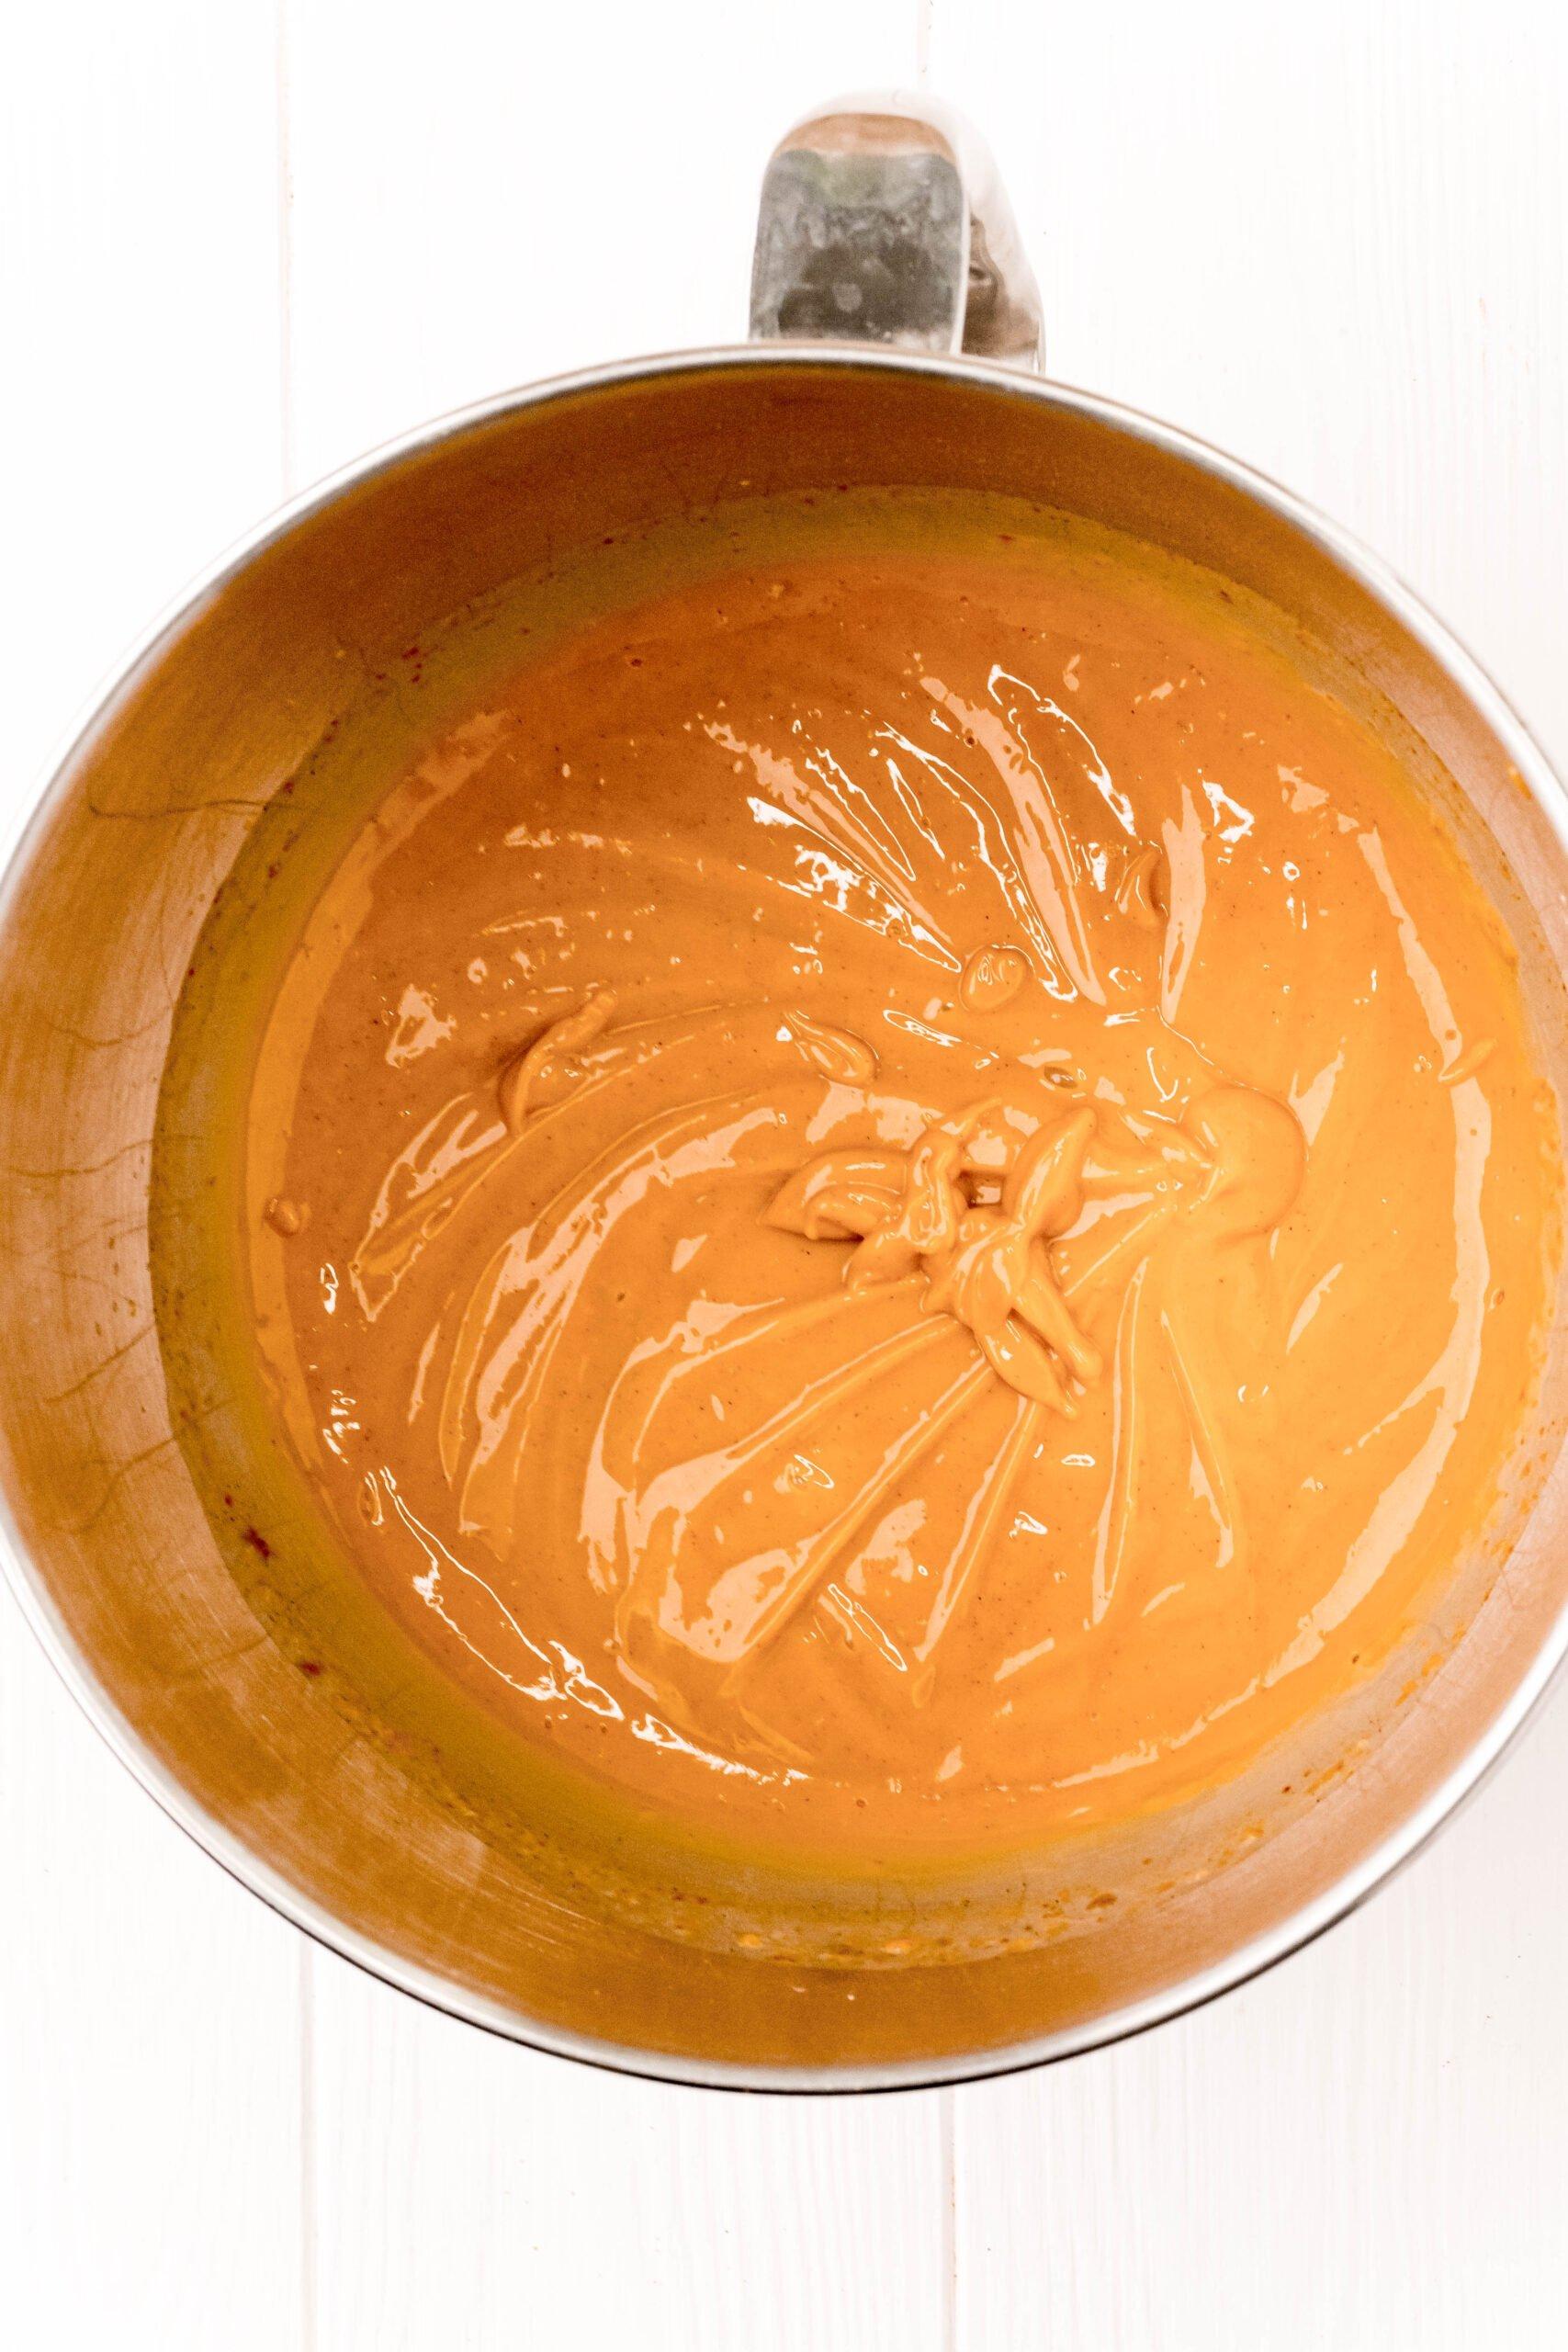 metal bowl with pumpkin pudding